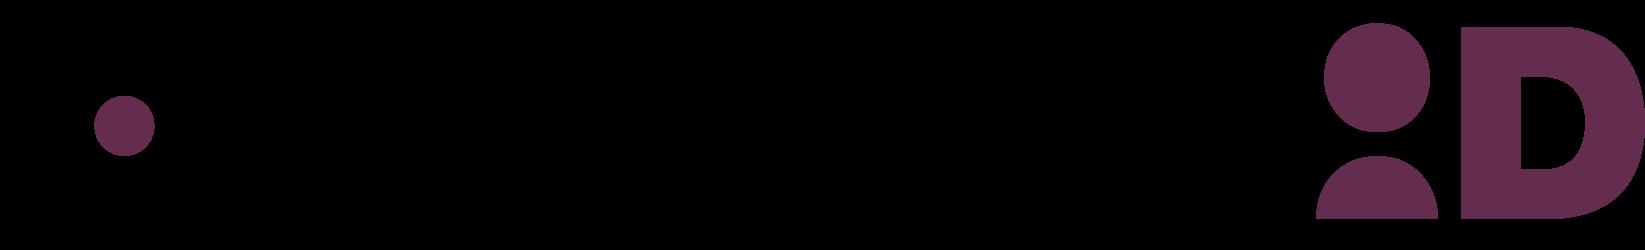 Namirial ID